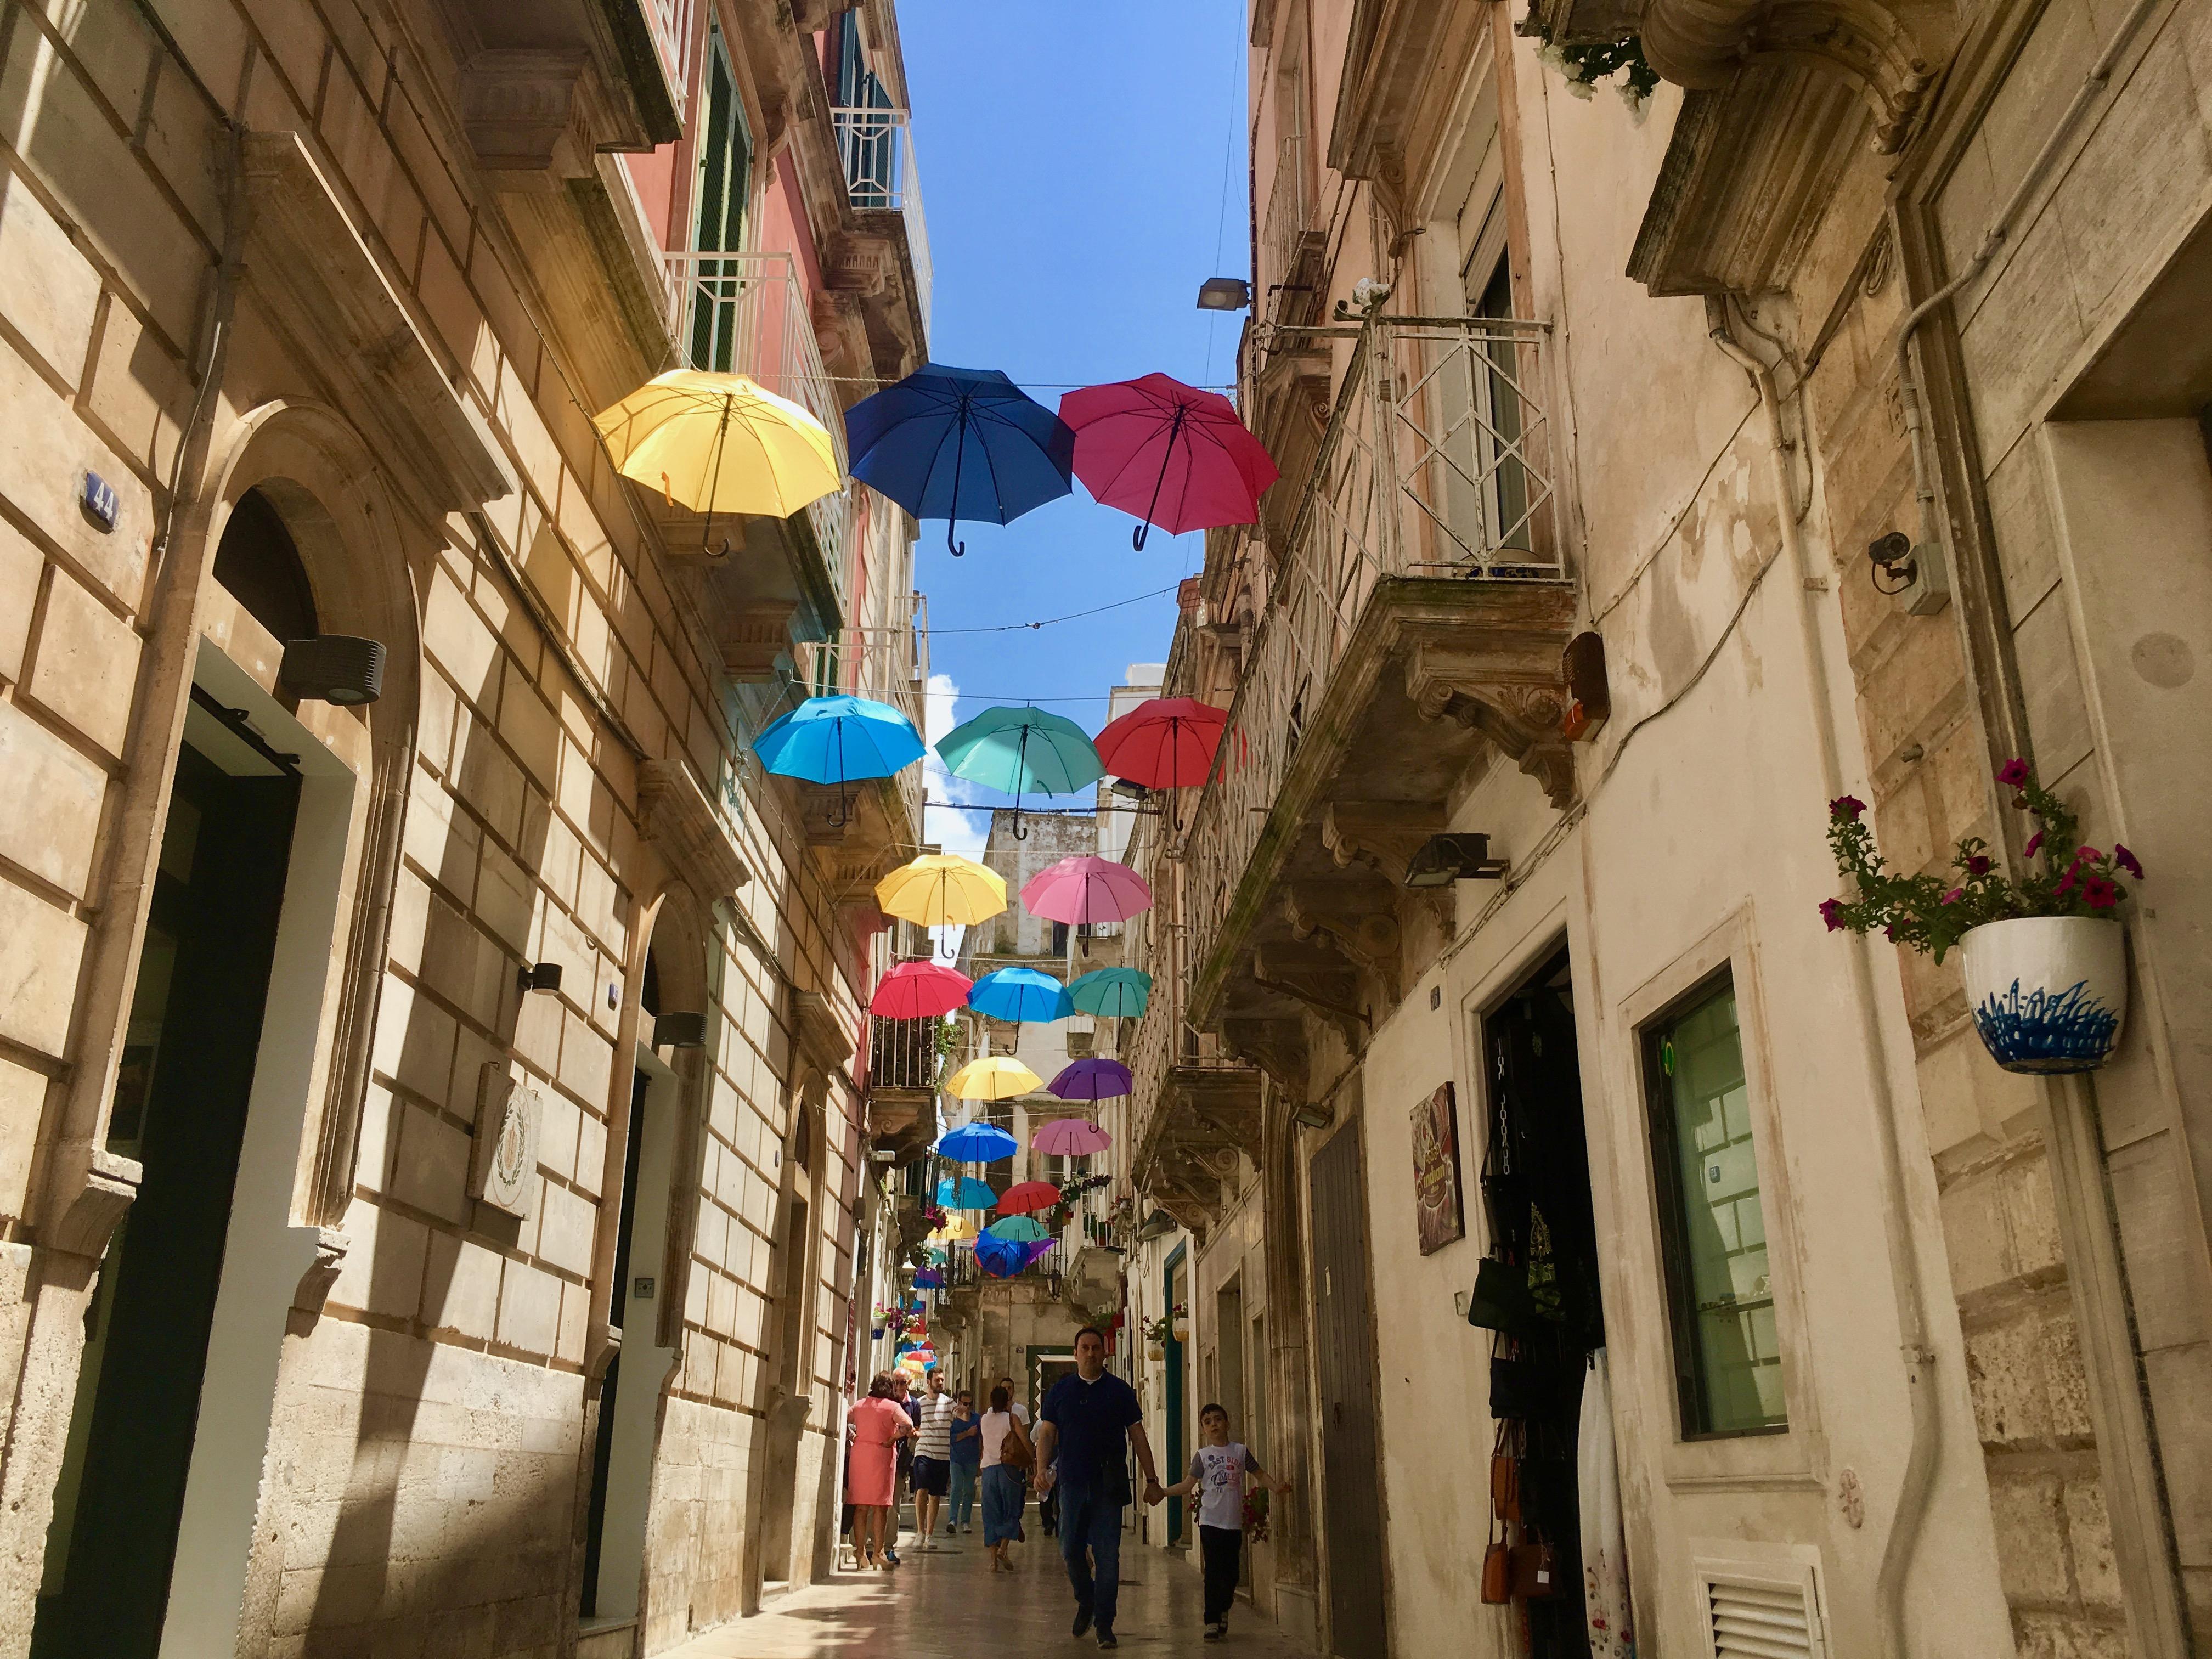 Martina Franca kolorowe parasole wiszące nad ulicą